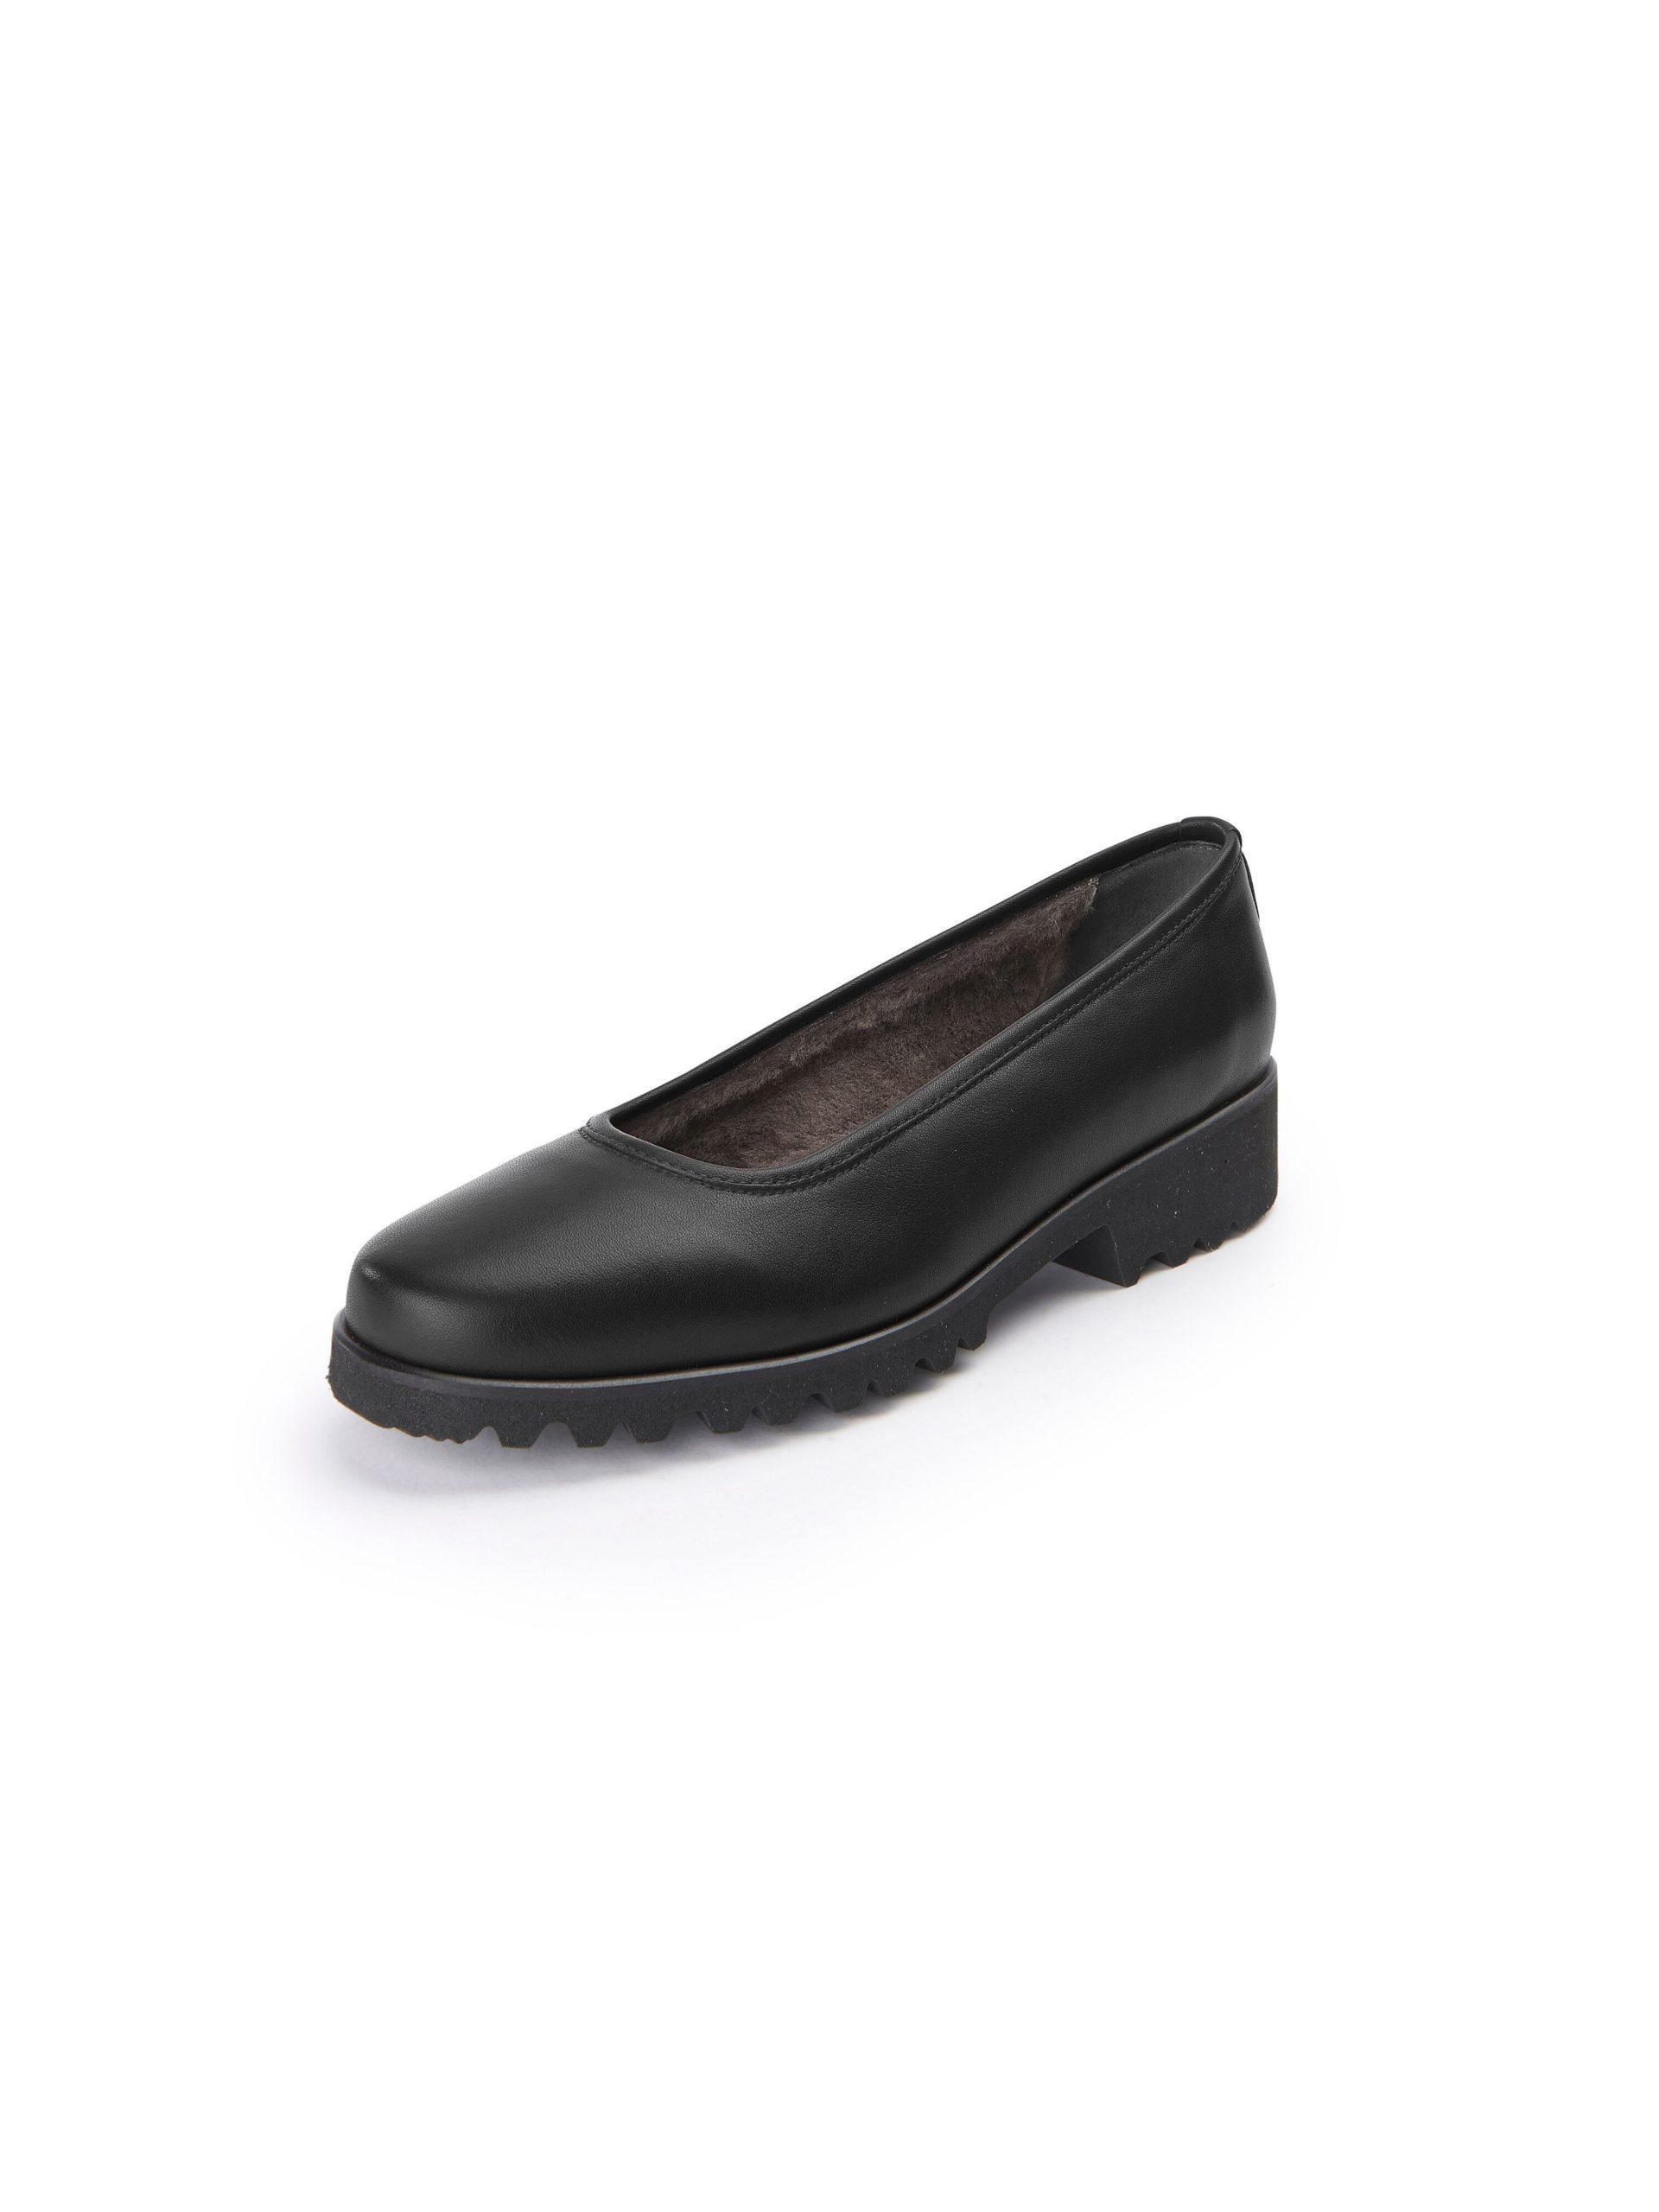 Ballerina's Van Ledoni zwart Kopen